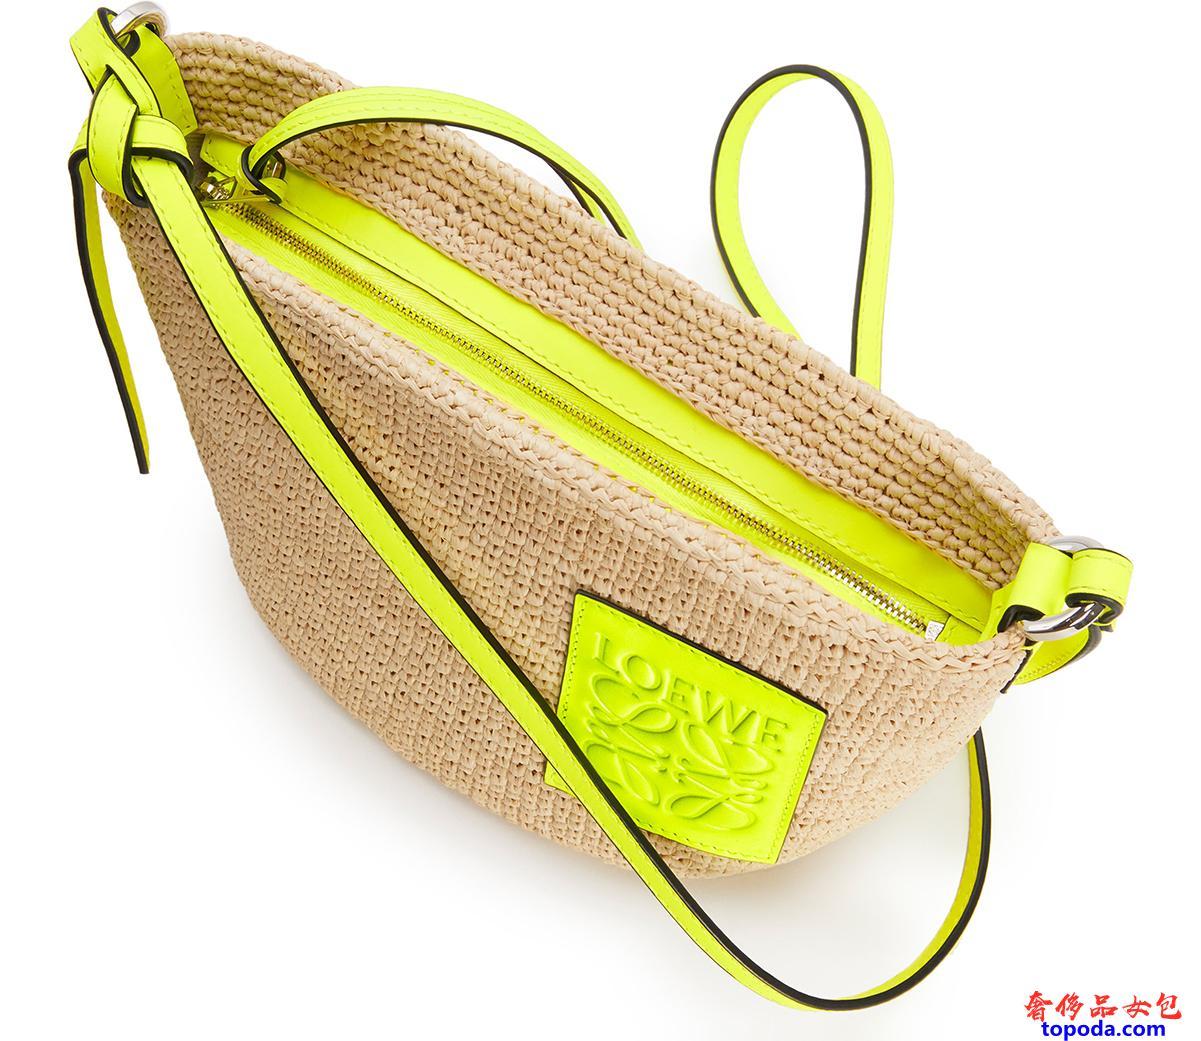 Loewe Paula's Ibiza Pochette拉菲草皮革单肩包